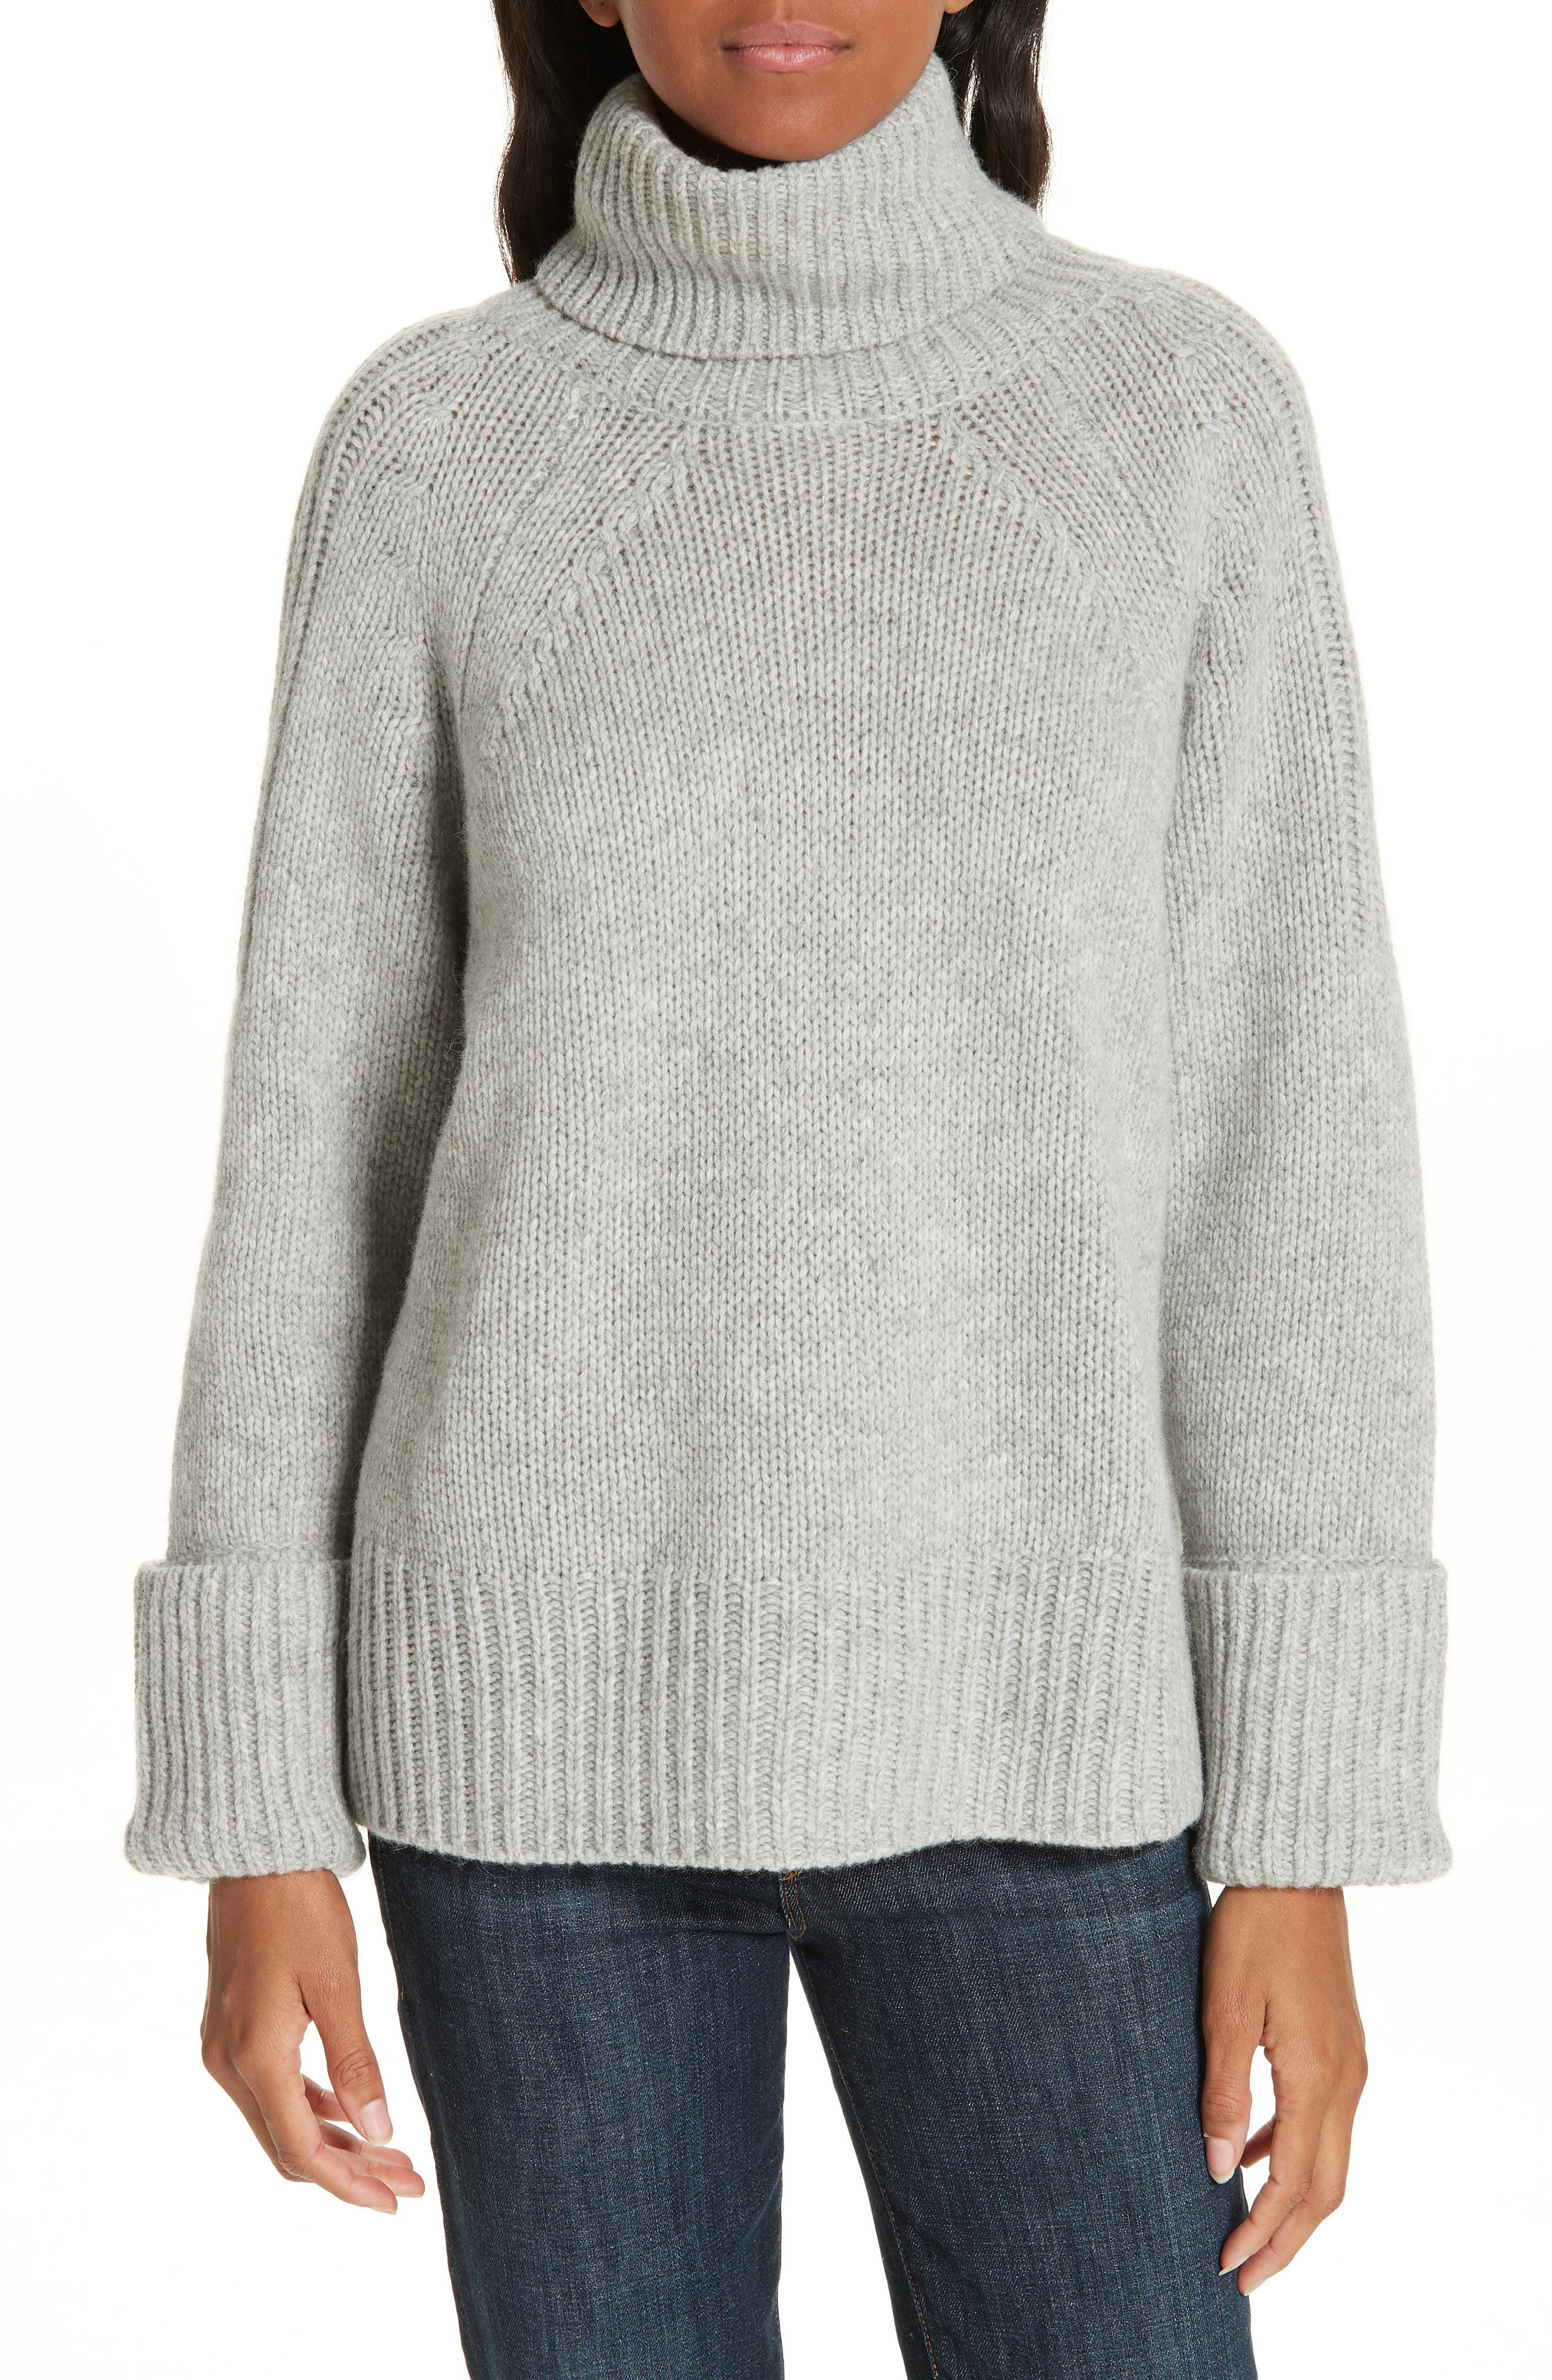 Nagora Sweater,                             Main thumbnail 1, color,                             020